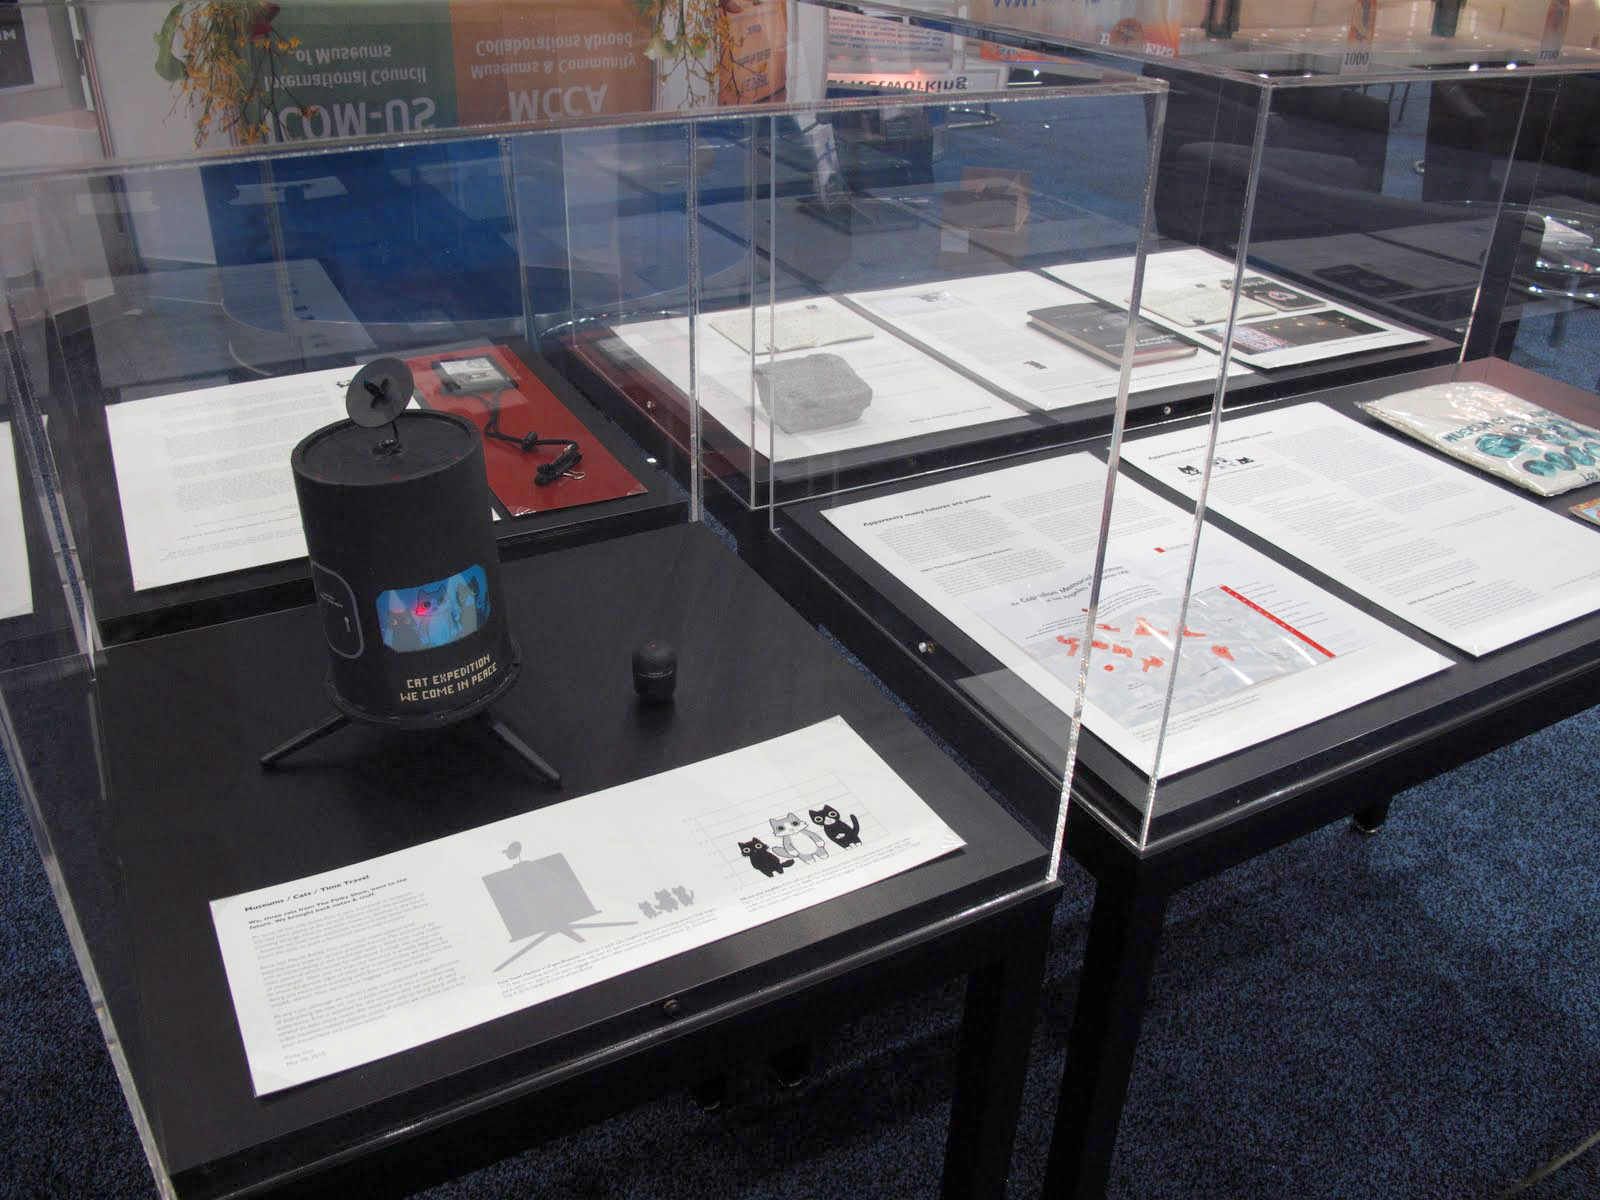 futuremuseums_4366.jpg